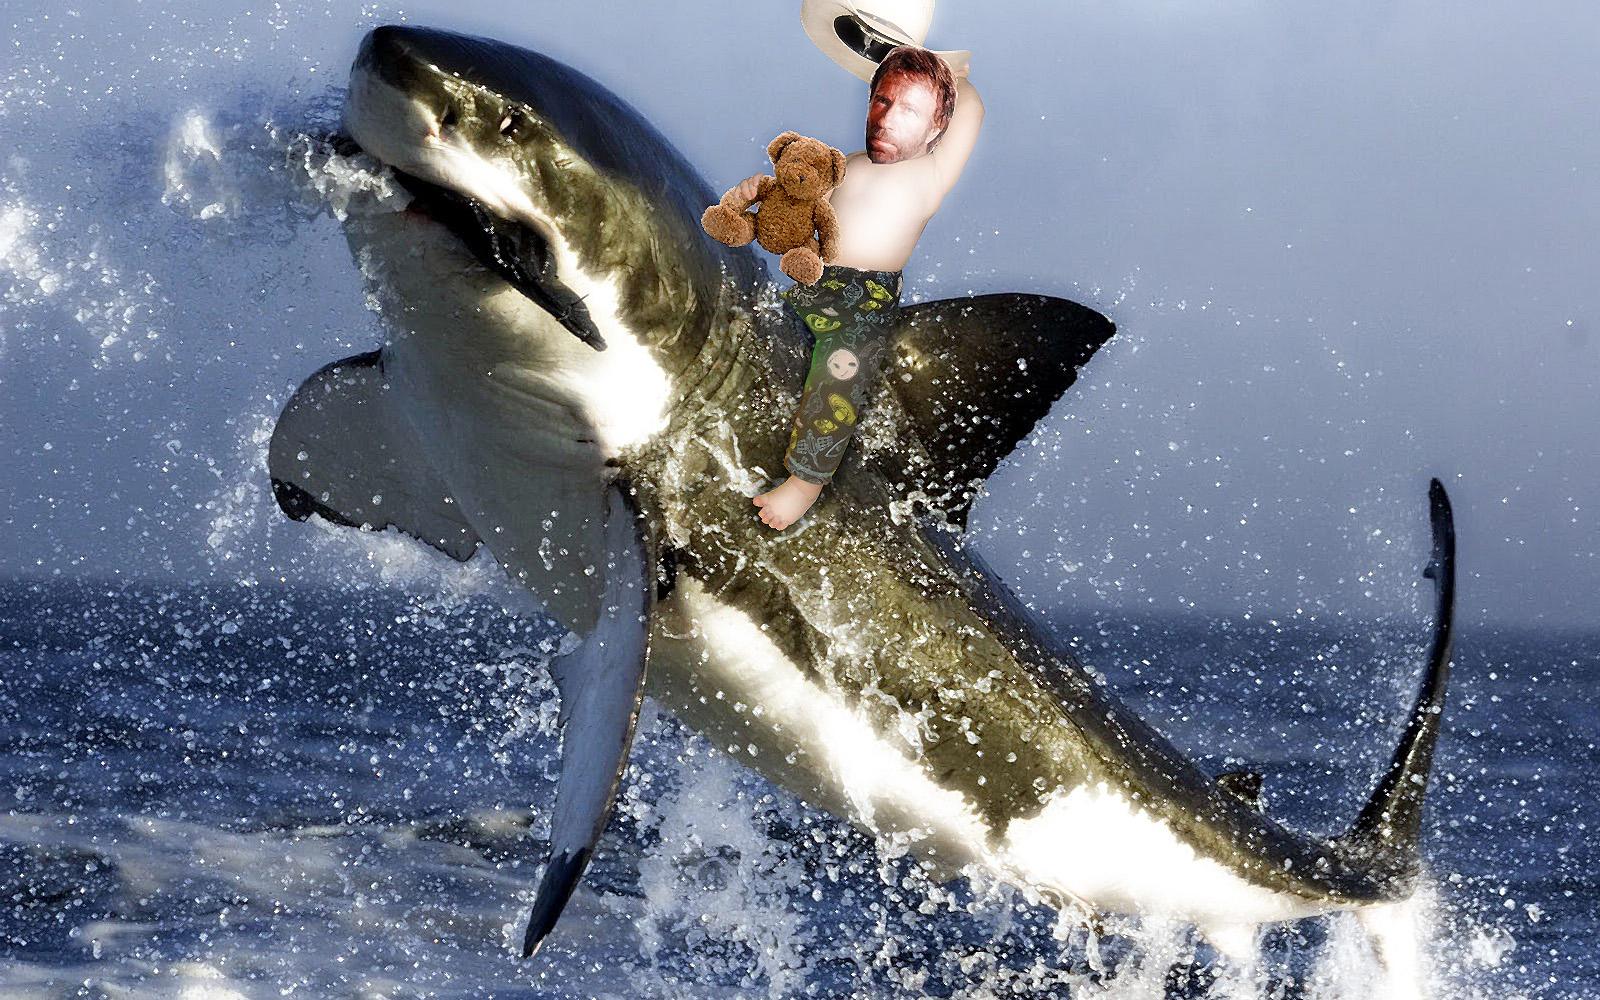 Chuck's Baby riding a white shark